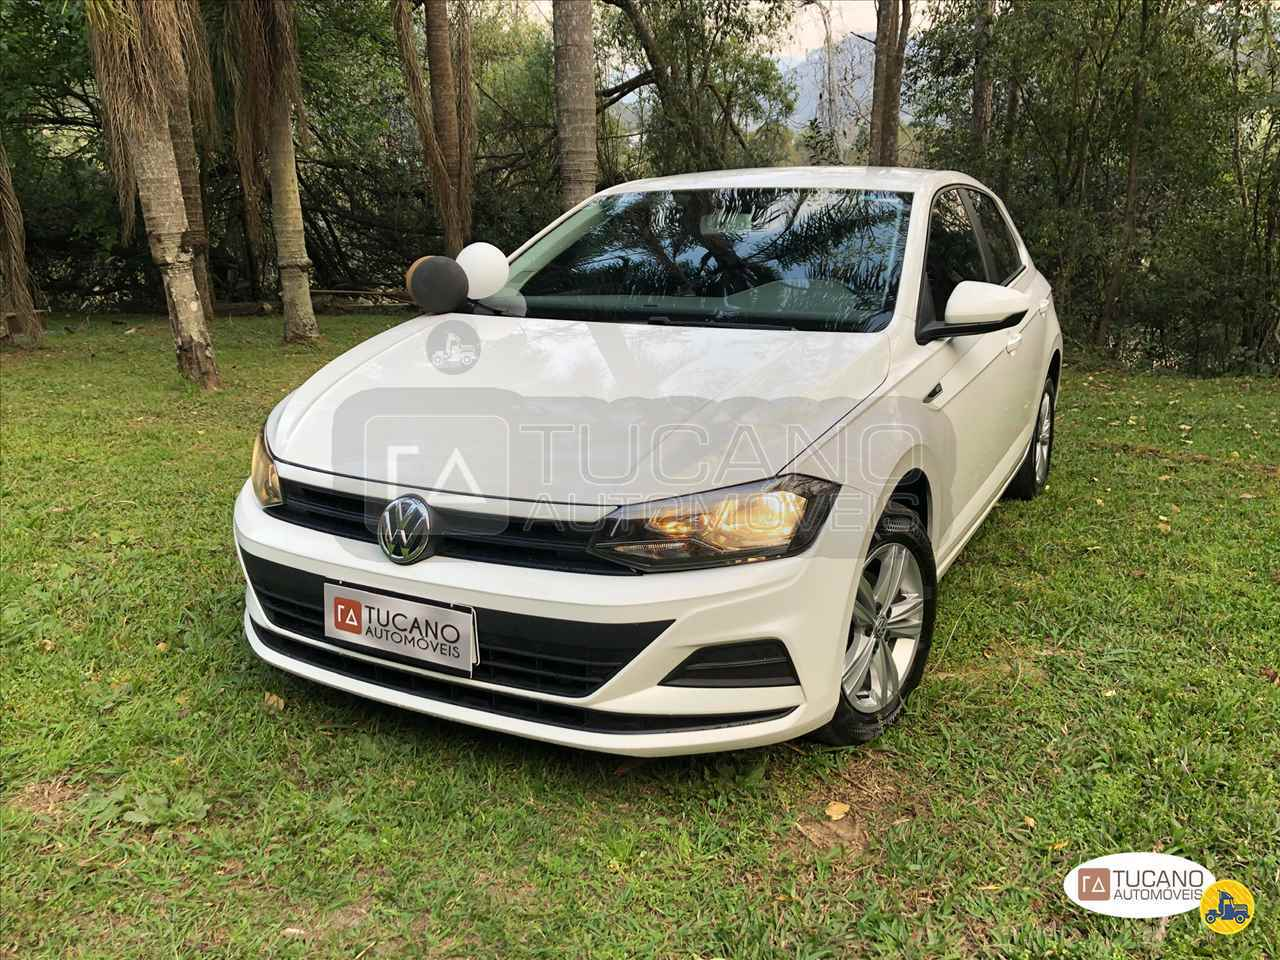 CARRO VW - Volkswagen Polo 1.6 MSI Tucano Automóveis ALFREDO WAGNER SANTA CATARINA SC